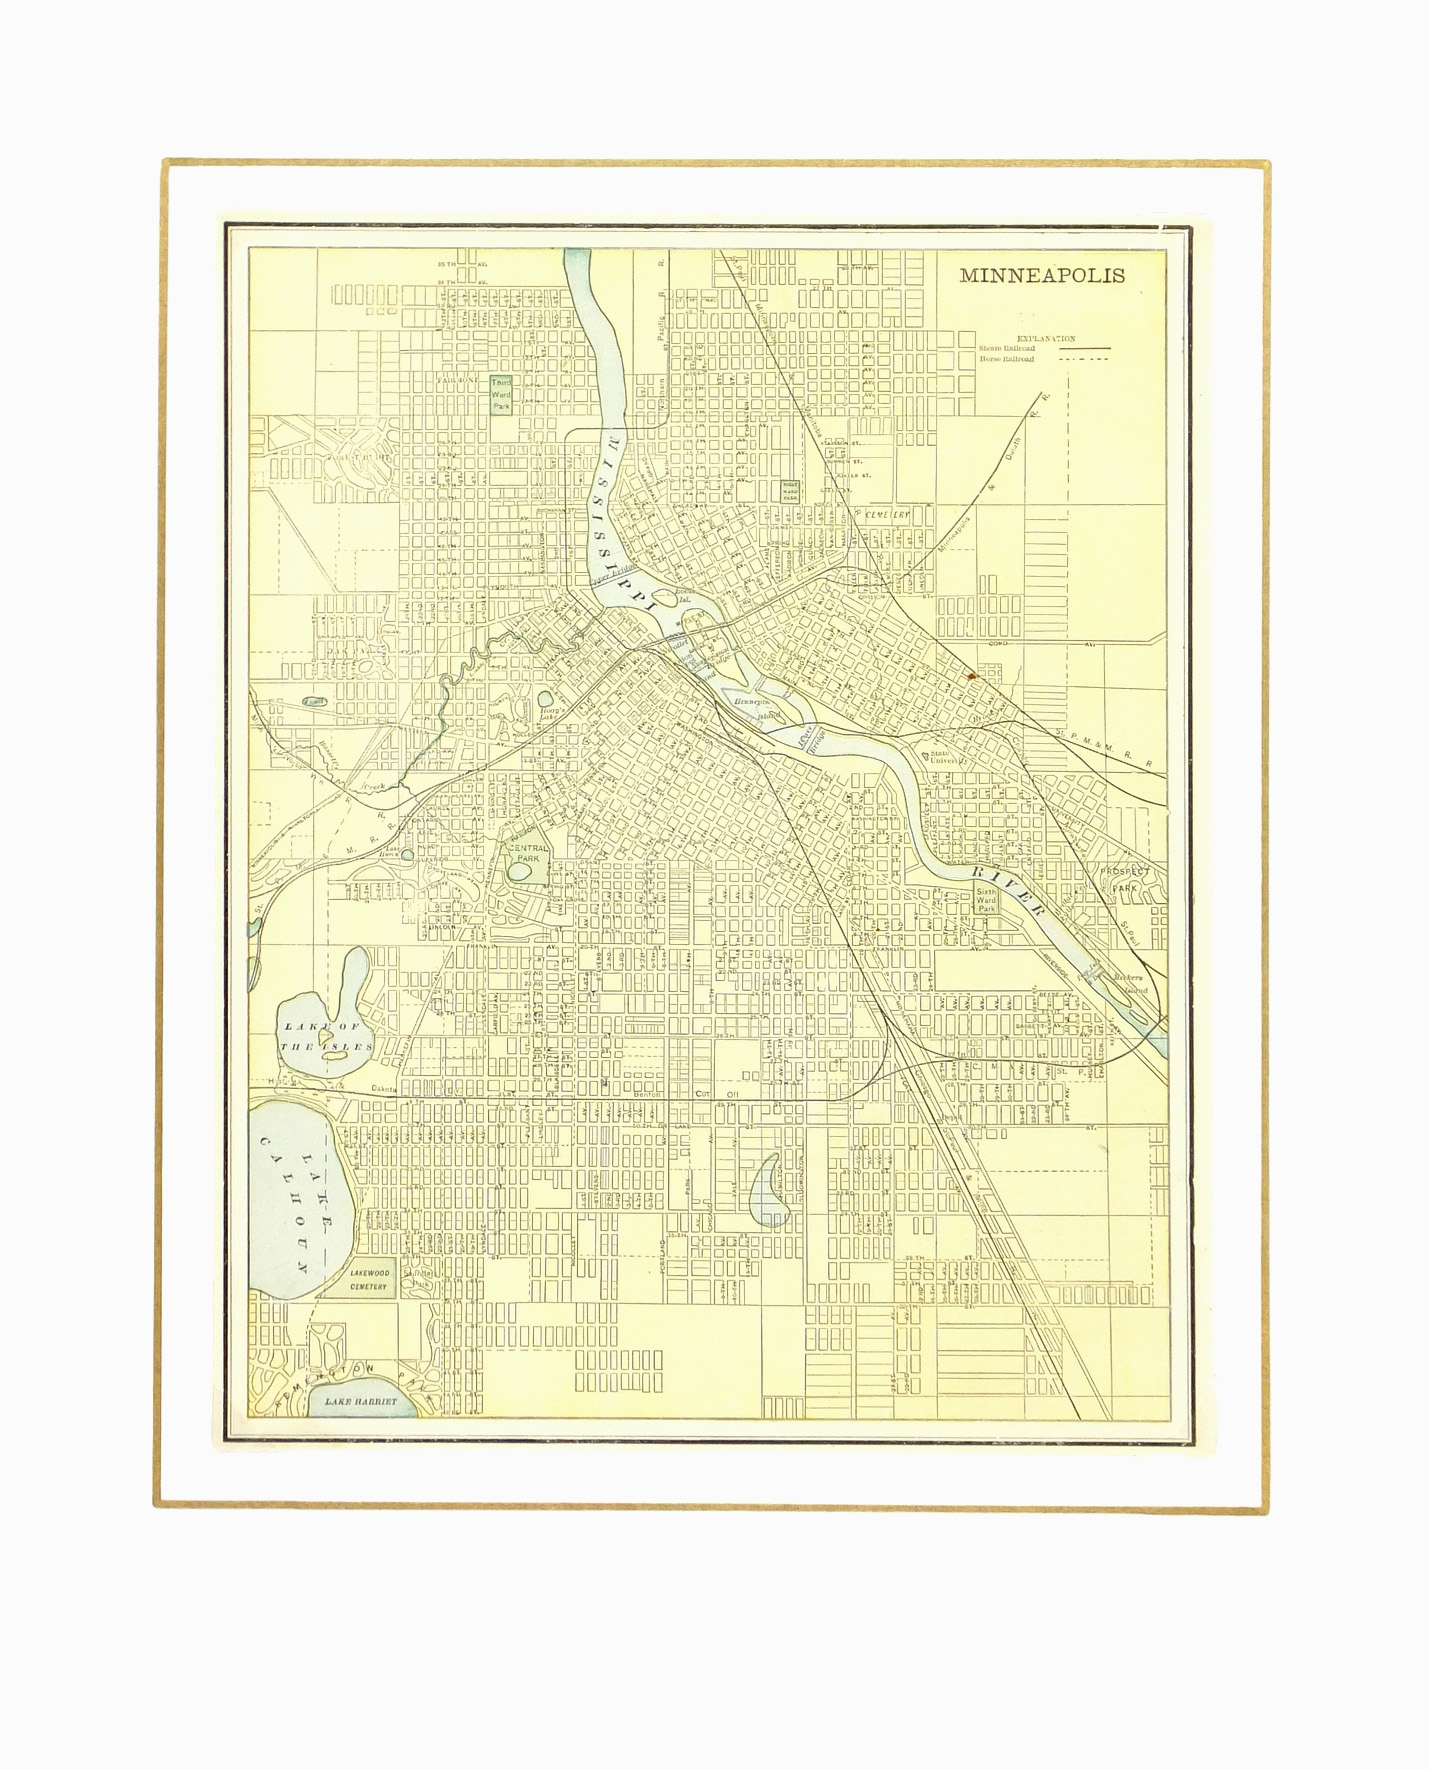 Minneapolis, 1889-matted-7647K